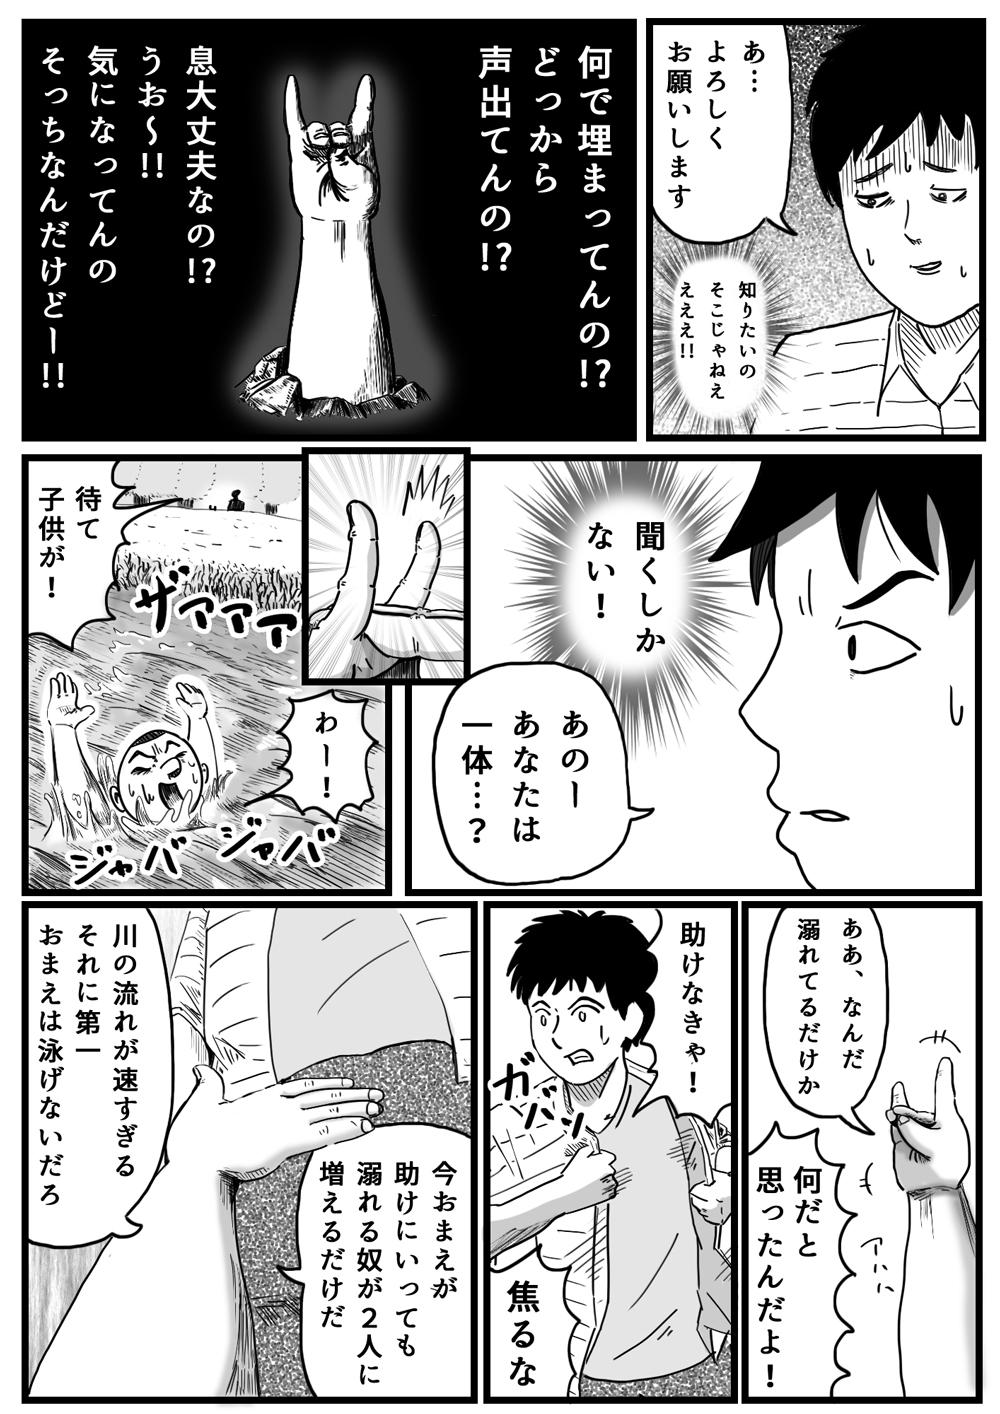 arnolds-hasegawa-002-2